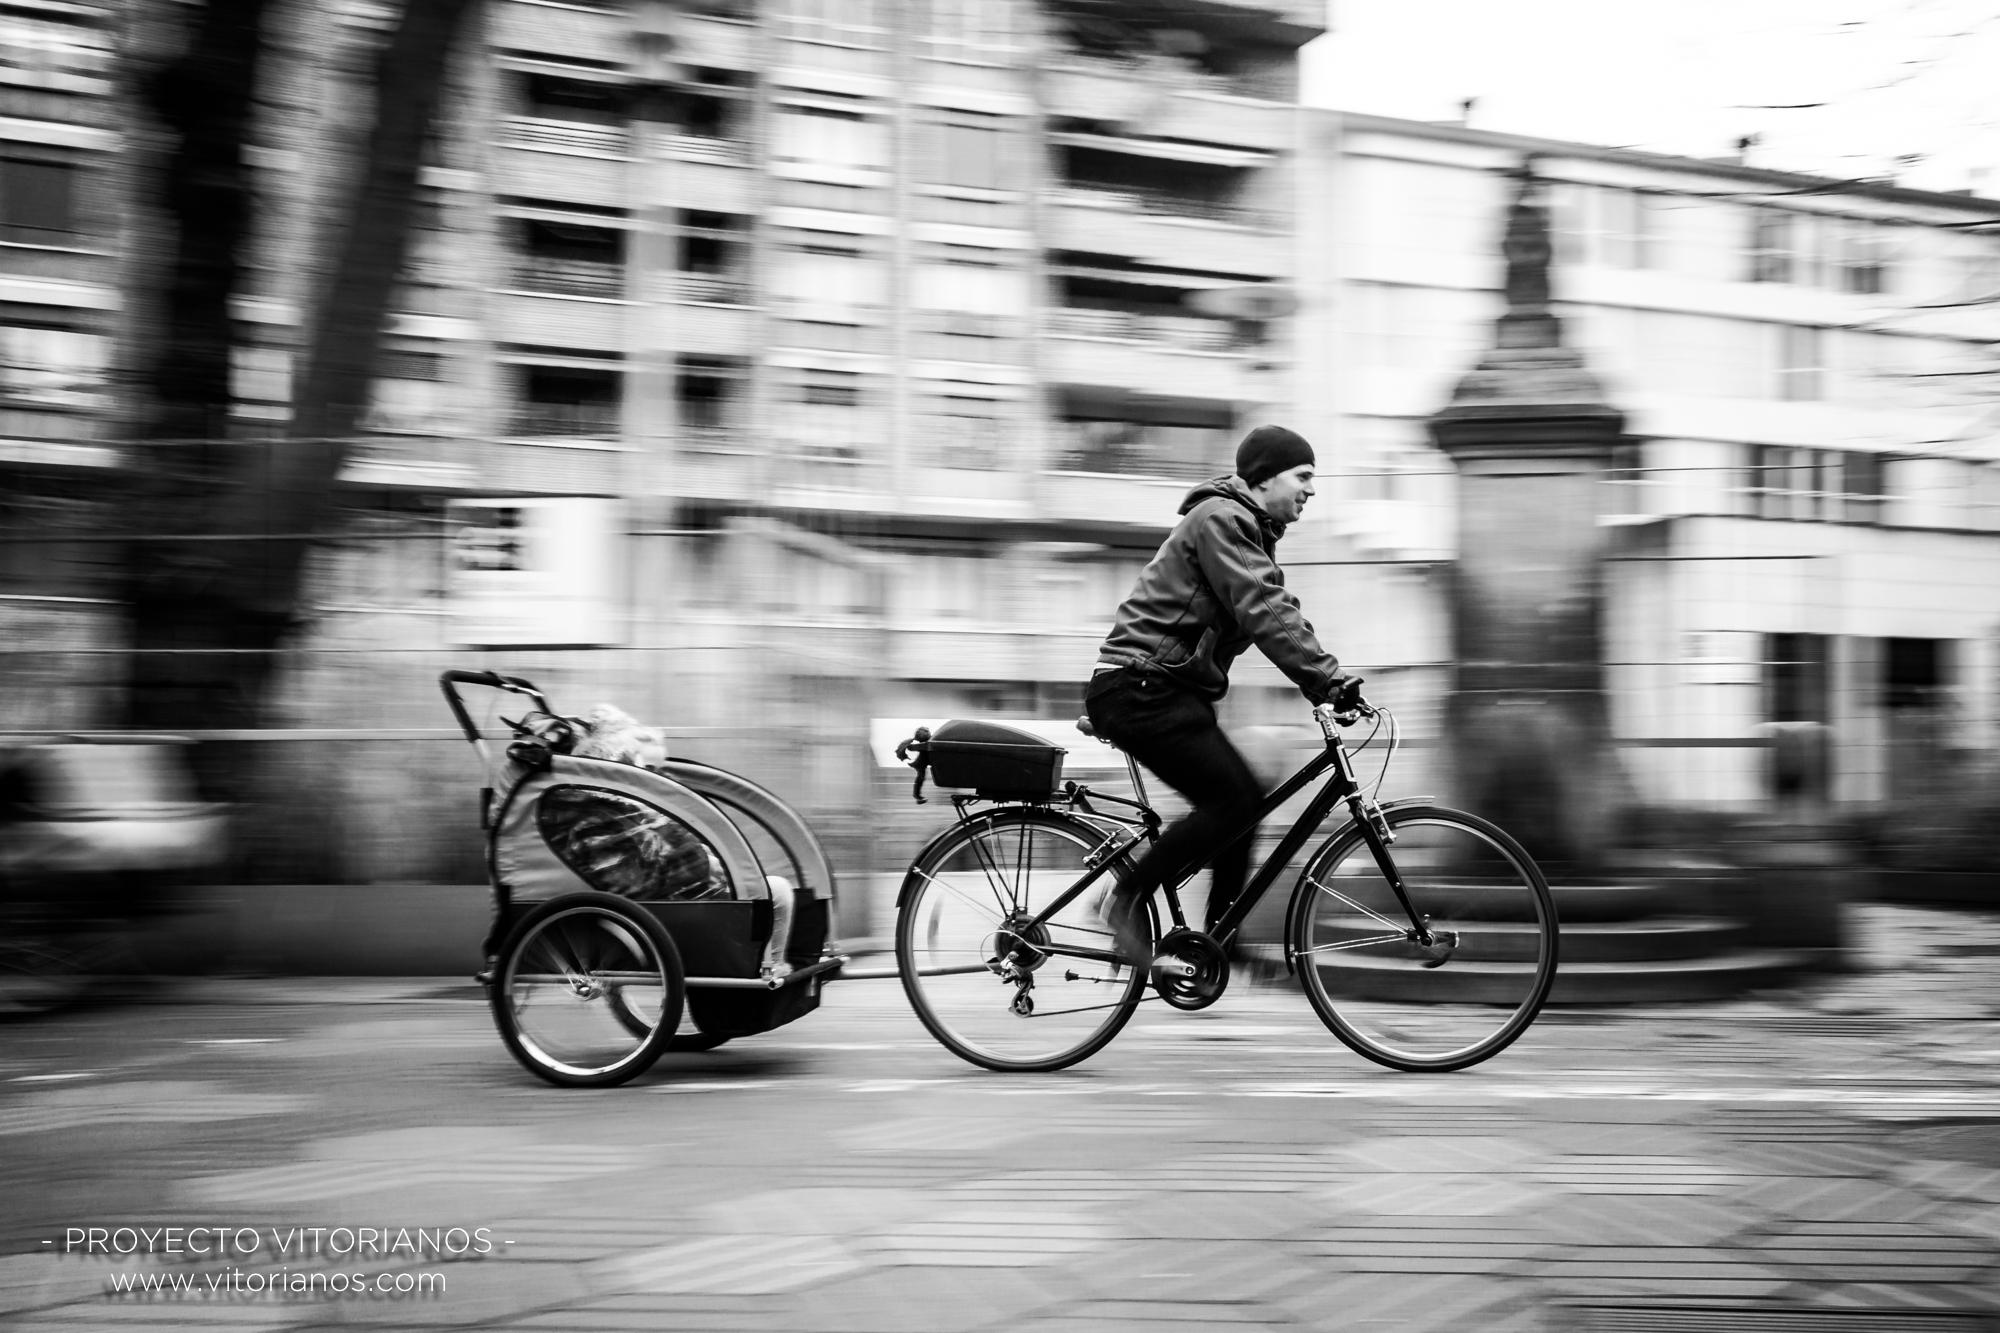 Vitoriano en bici - Foto: Bea Cañas